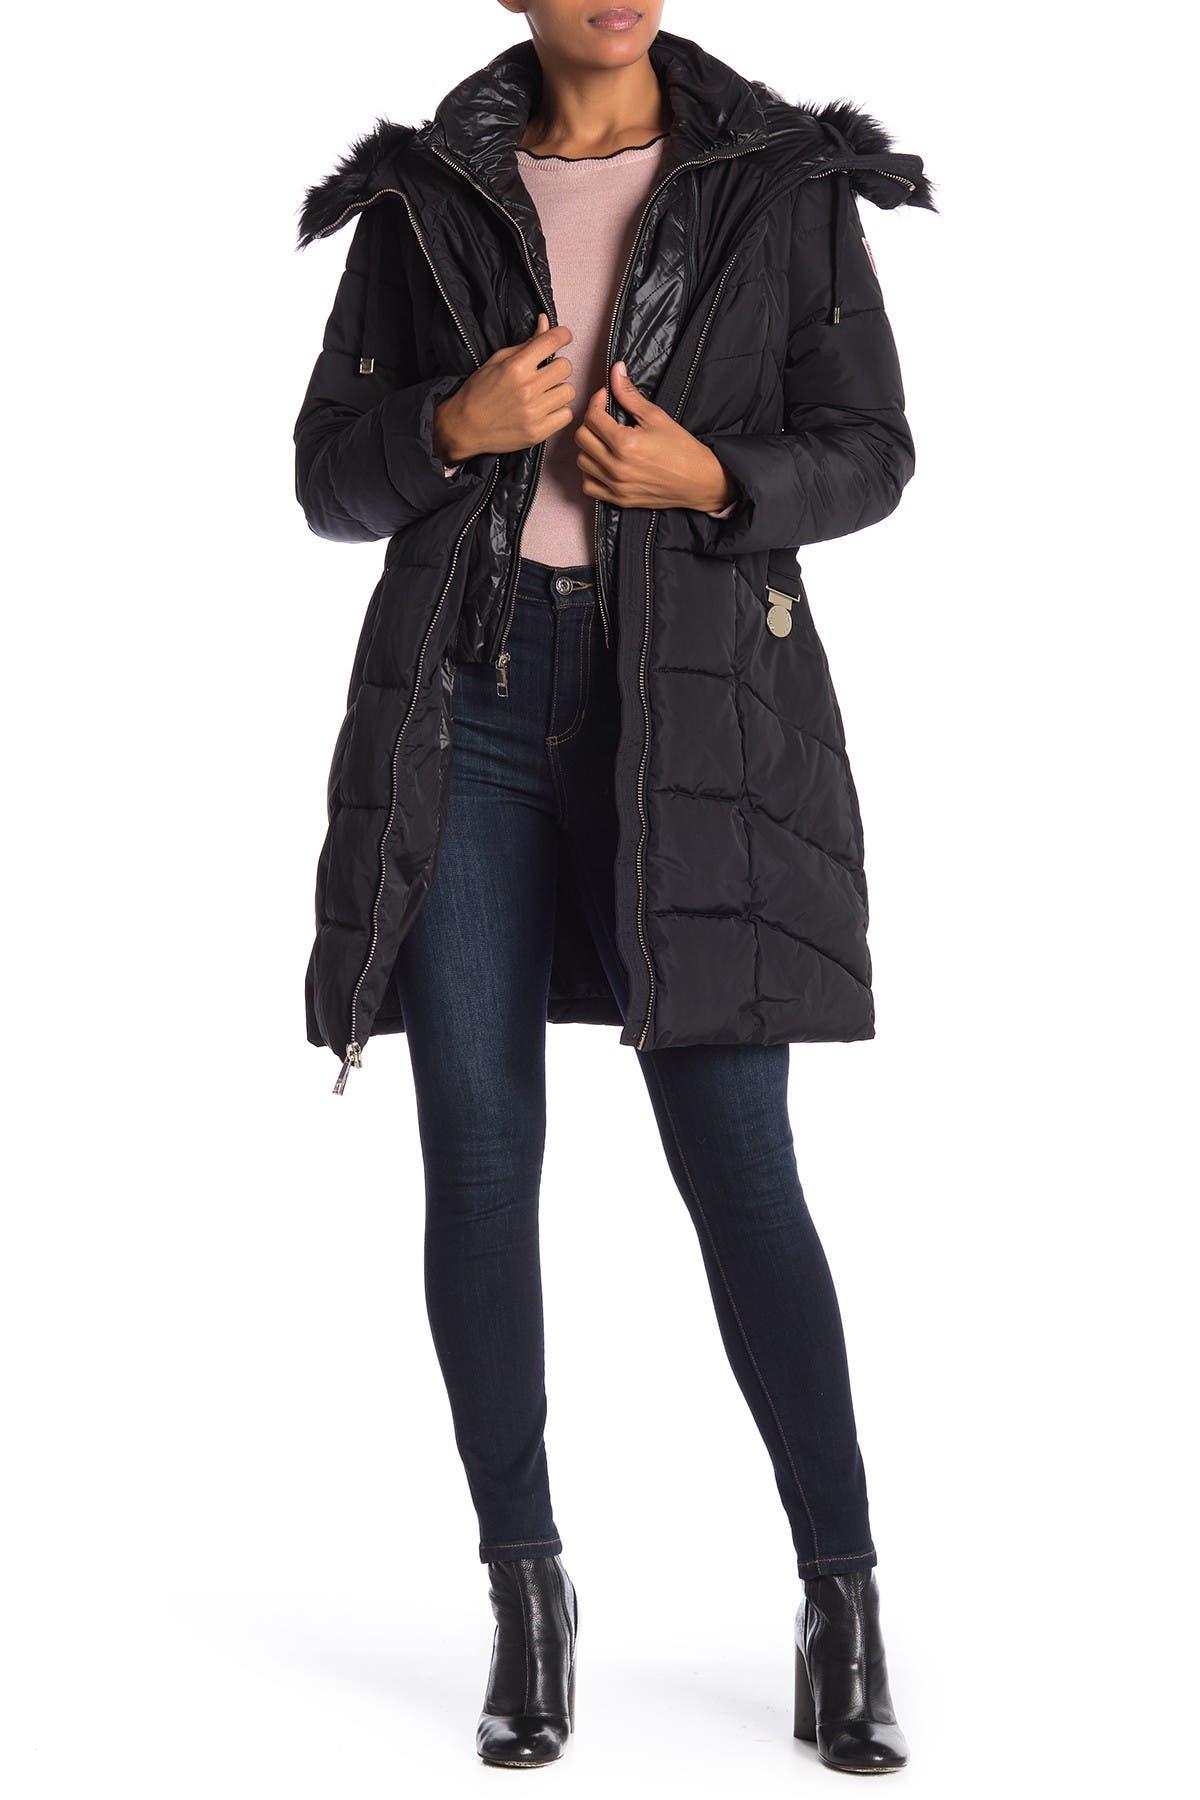 Guess Faux Fur Trim Jacket Nordstrom Rack